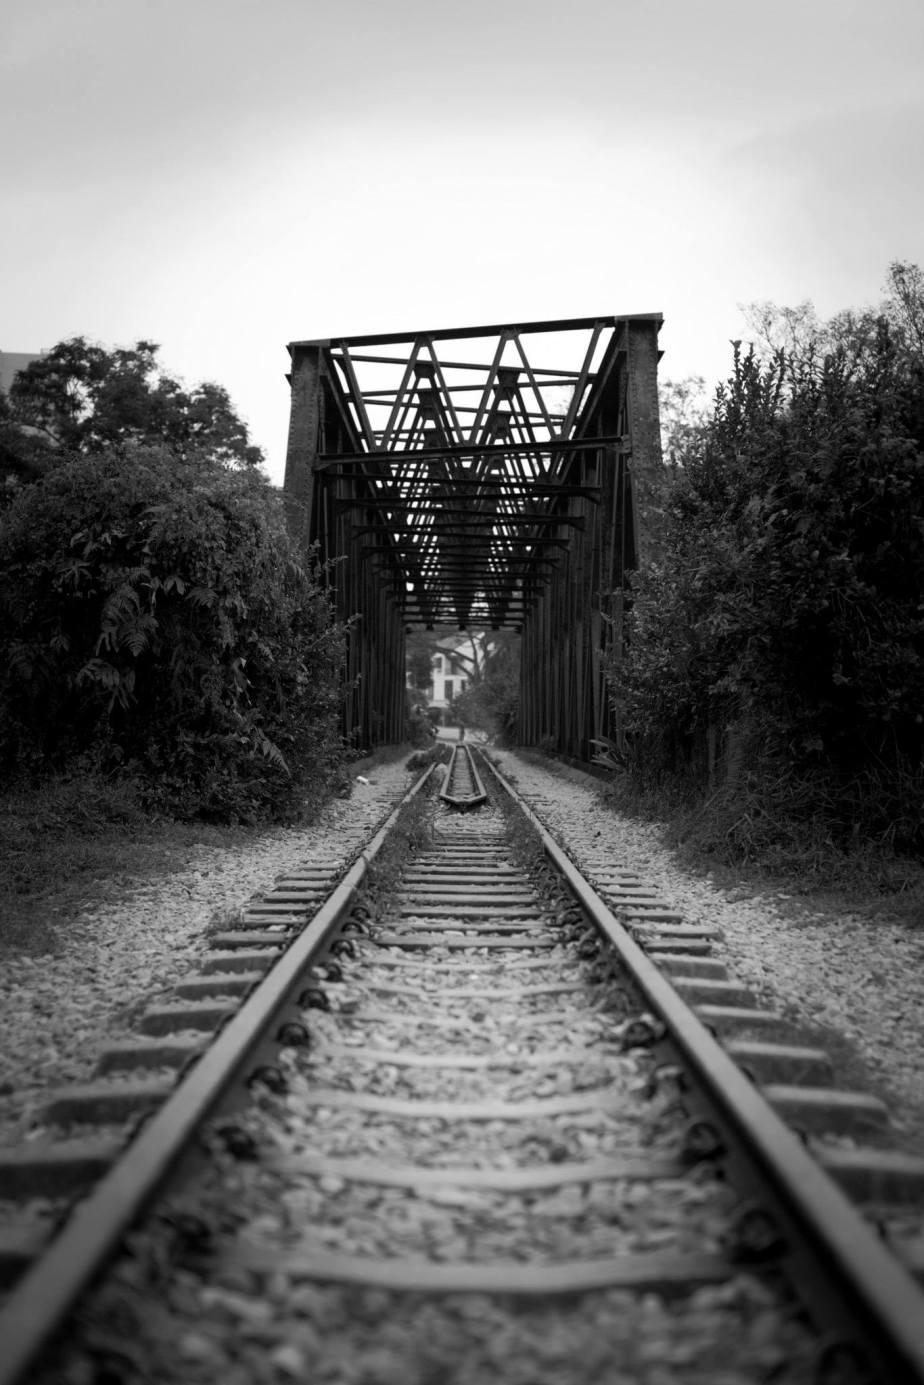 railyway-tracks